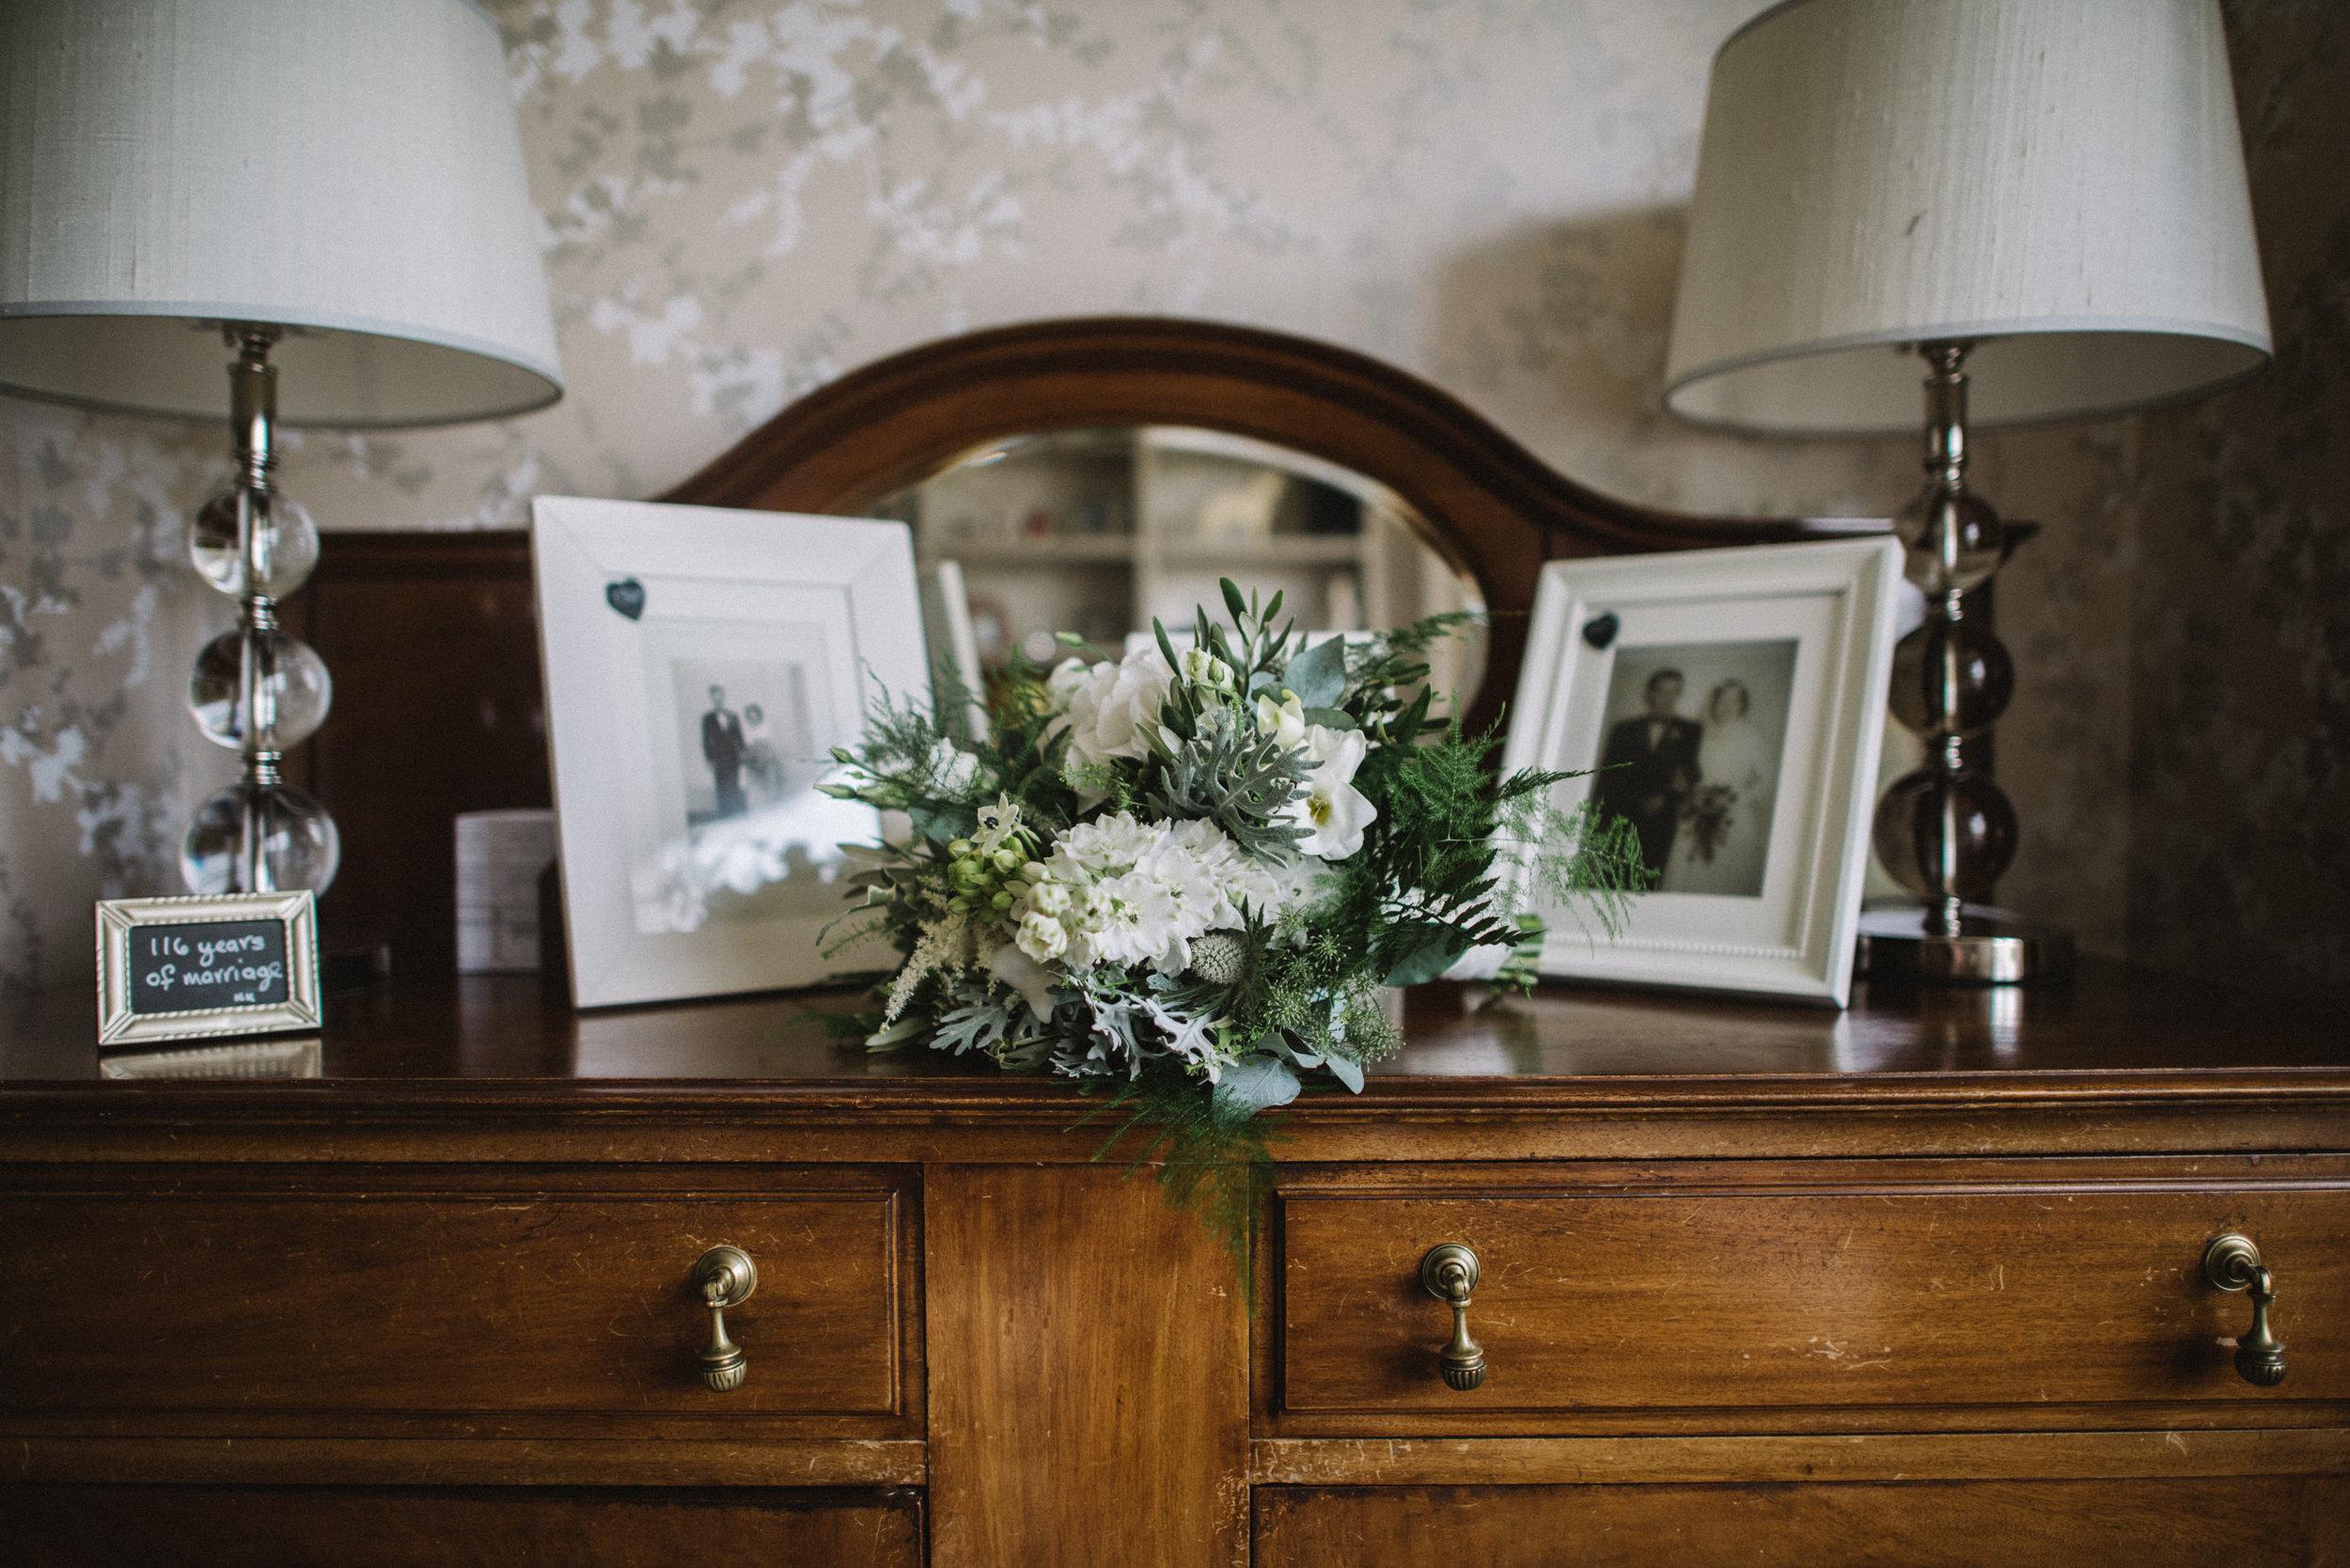 0170-LISA-DEVINE-PHOTOGRAPHY-ALTERNATIVE-WEDDING-PHOTOGRAPHY-SCOTLAND-DESTINATION-WEDDINGS-GLASGOW-WEDDINGS-COOL-WEDDINGS-STYLISH-WEDDINGS.JPG